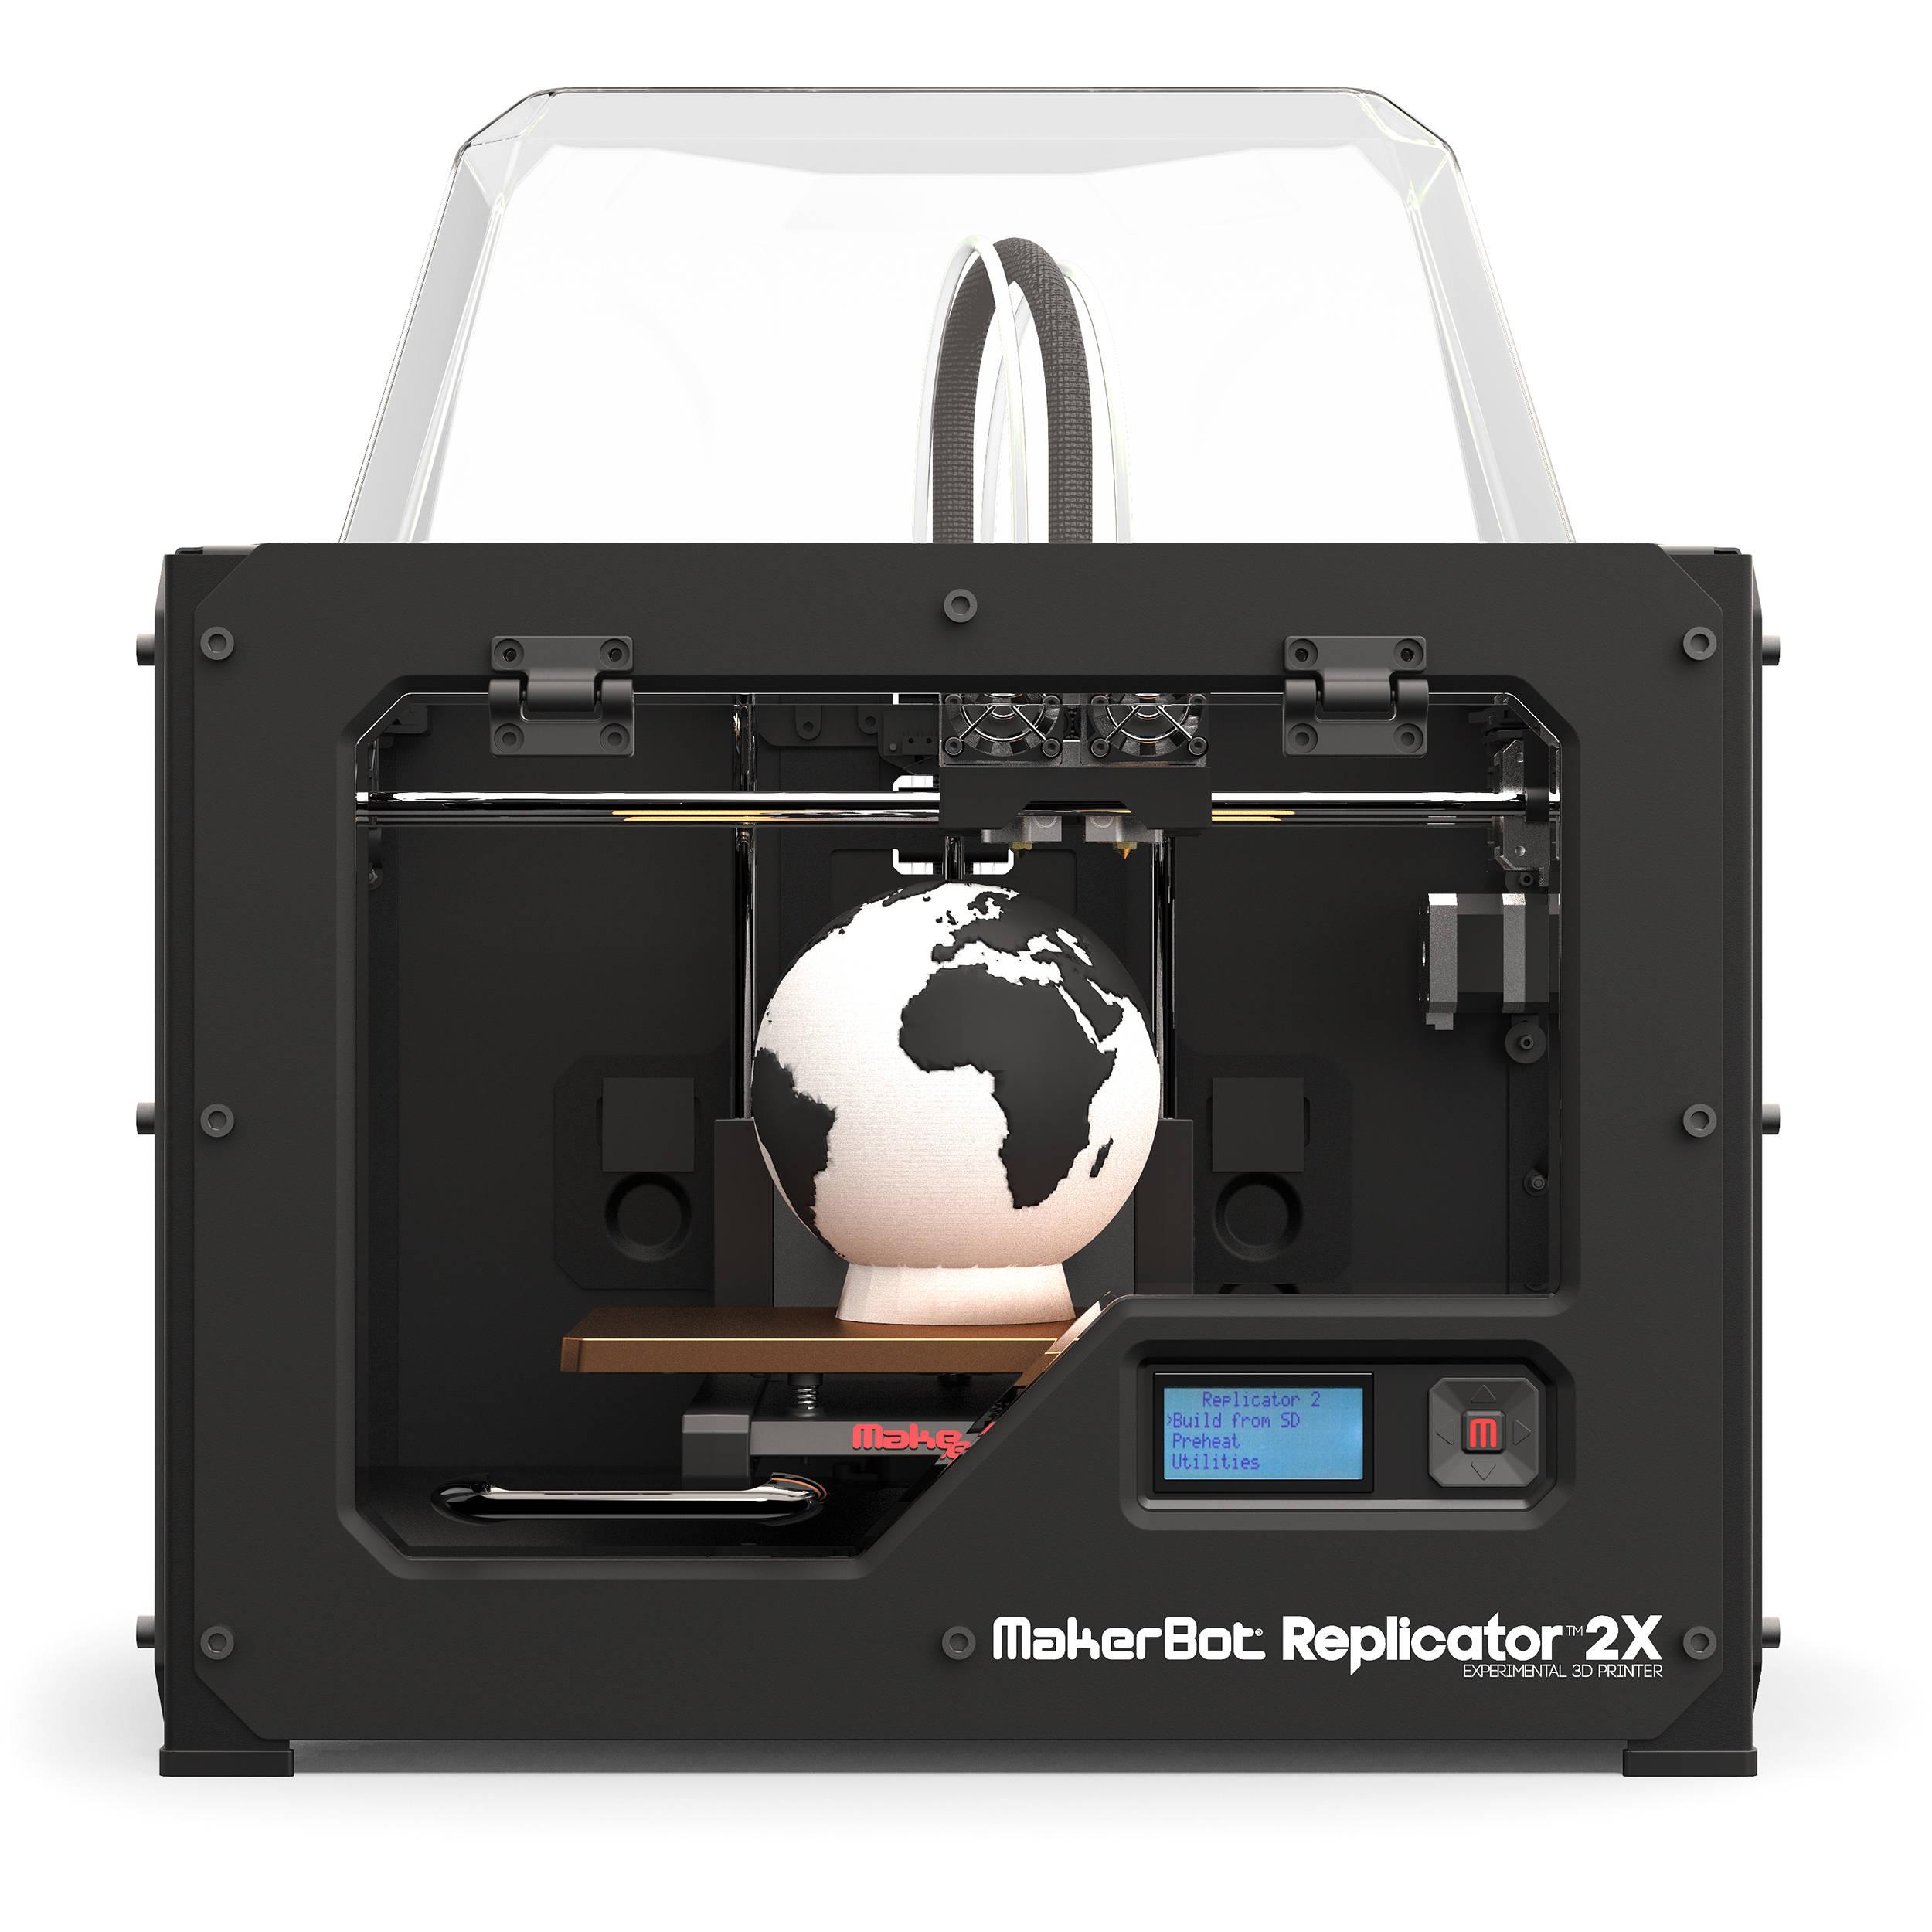 MakerBot Replicator 2X Experimental 3D Printer on